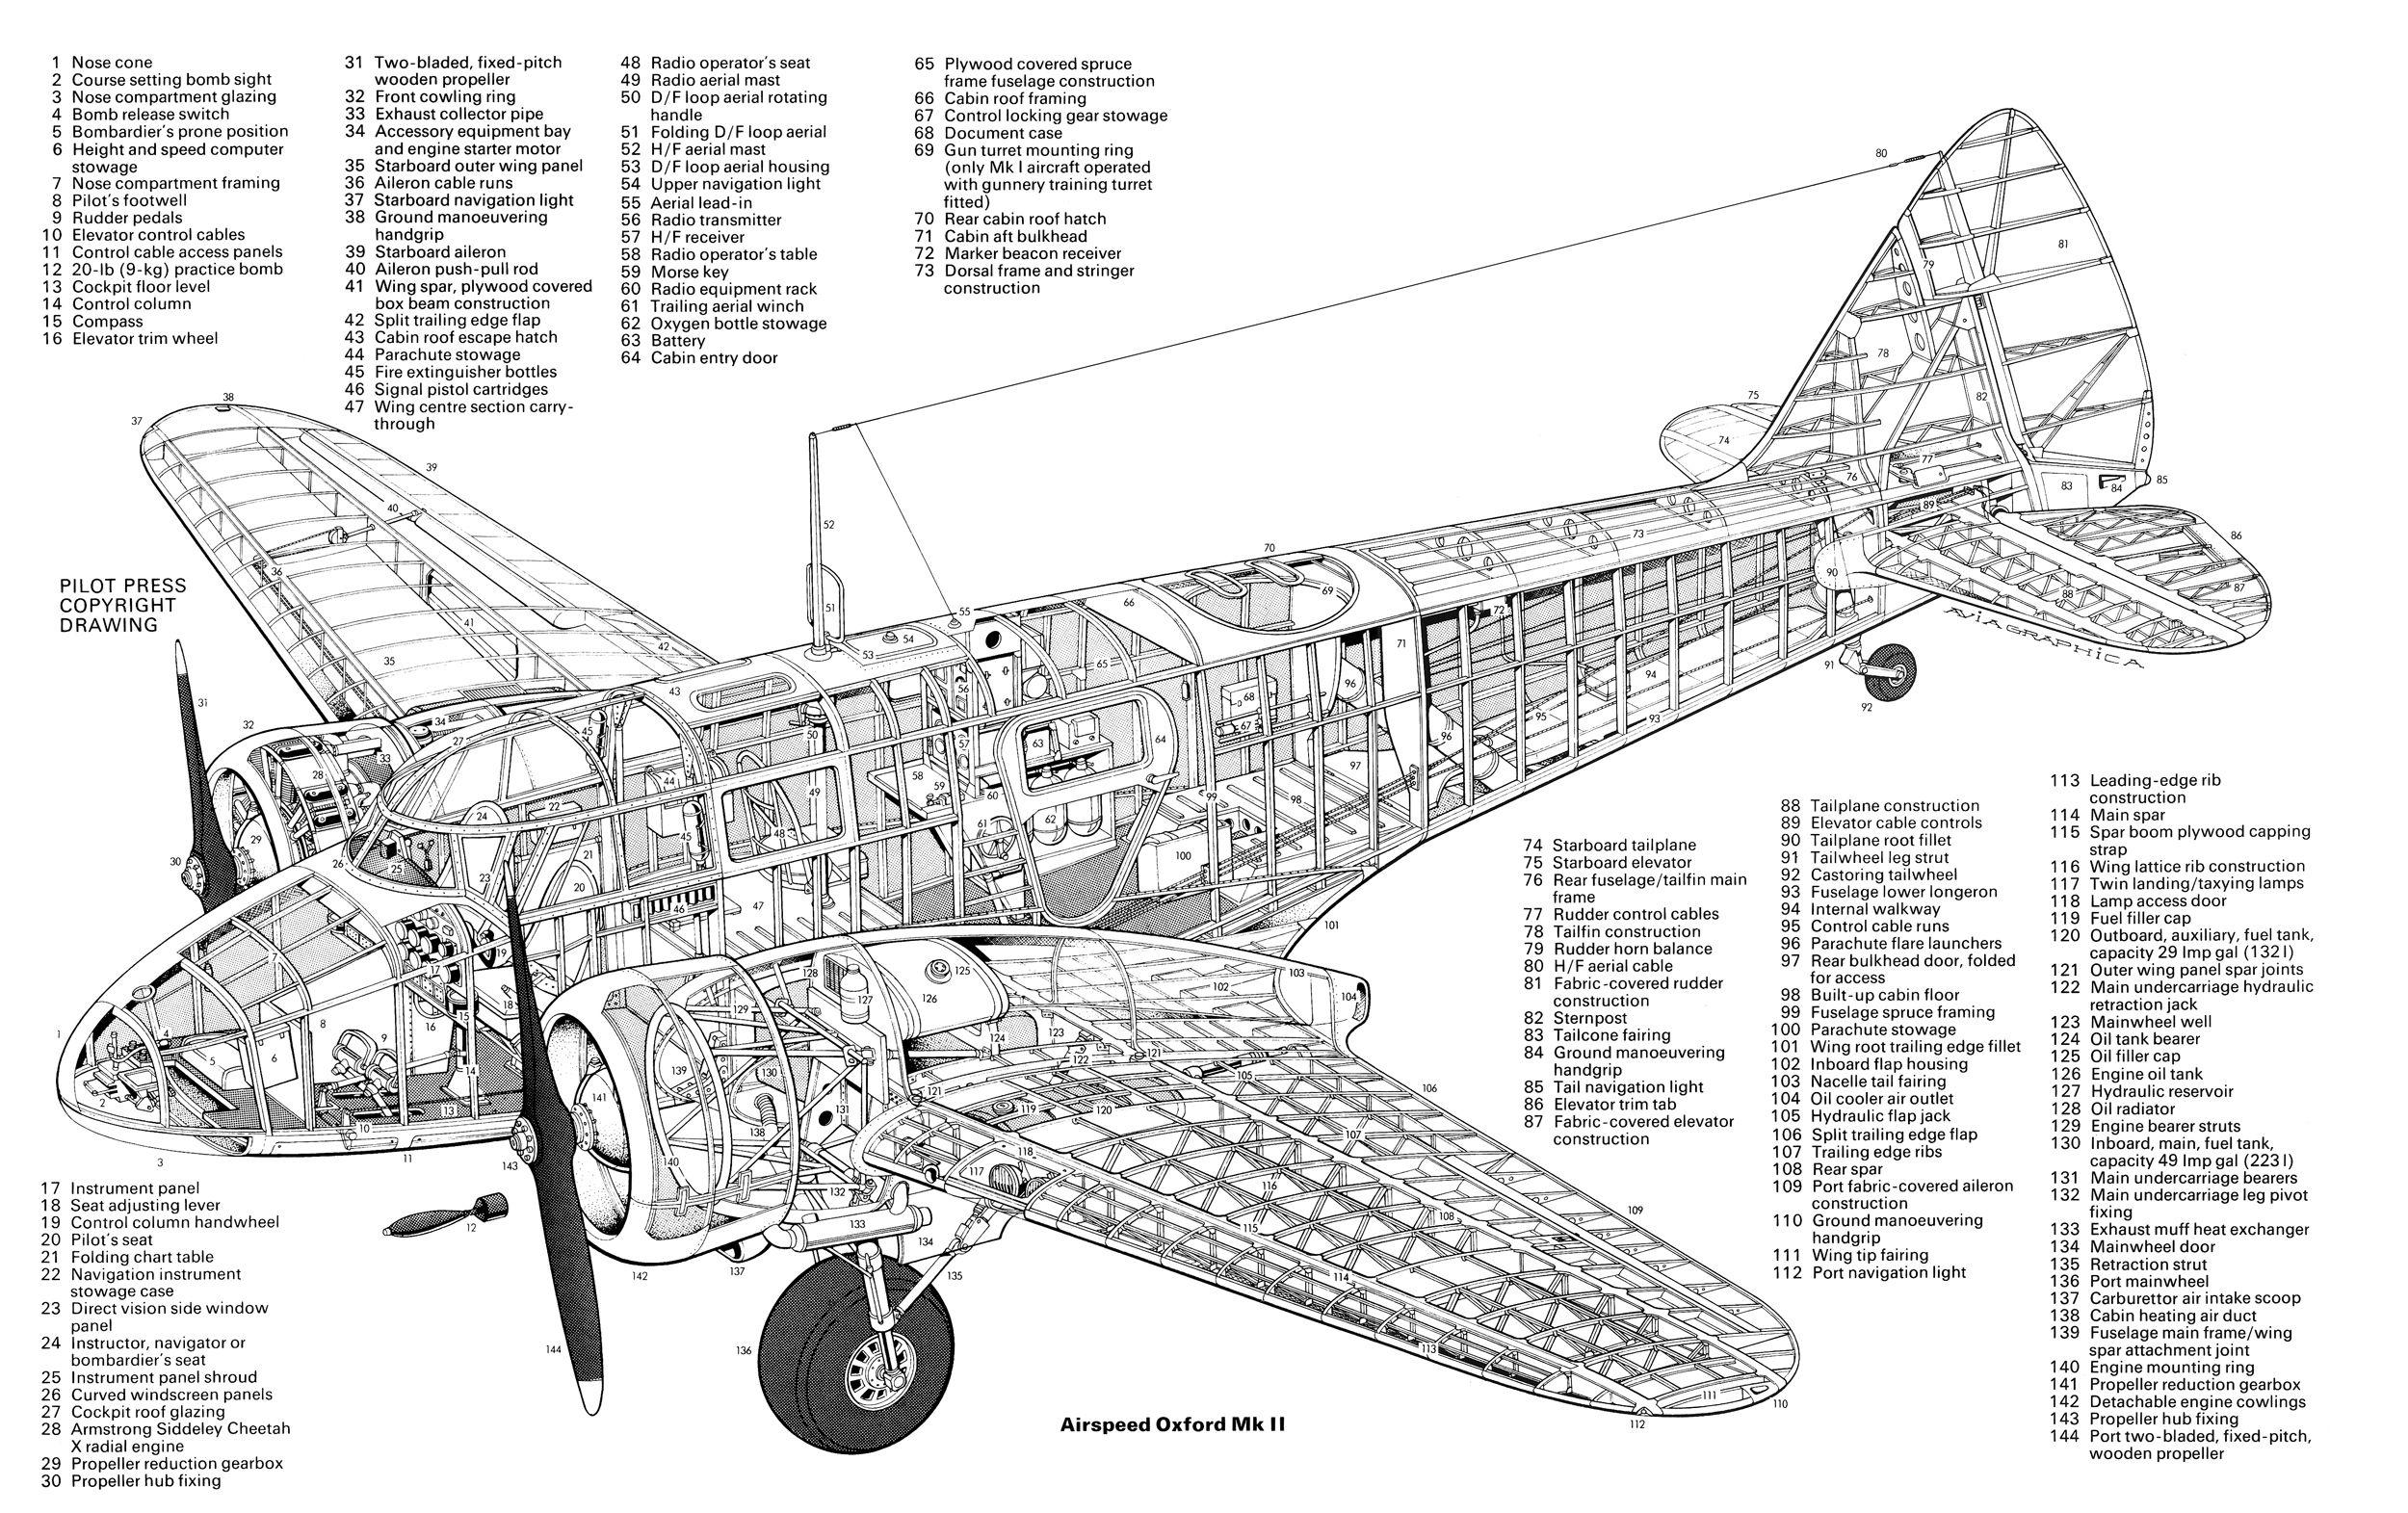 Airspeed Oxford Mk